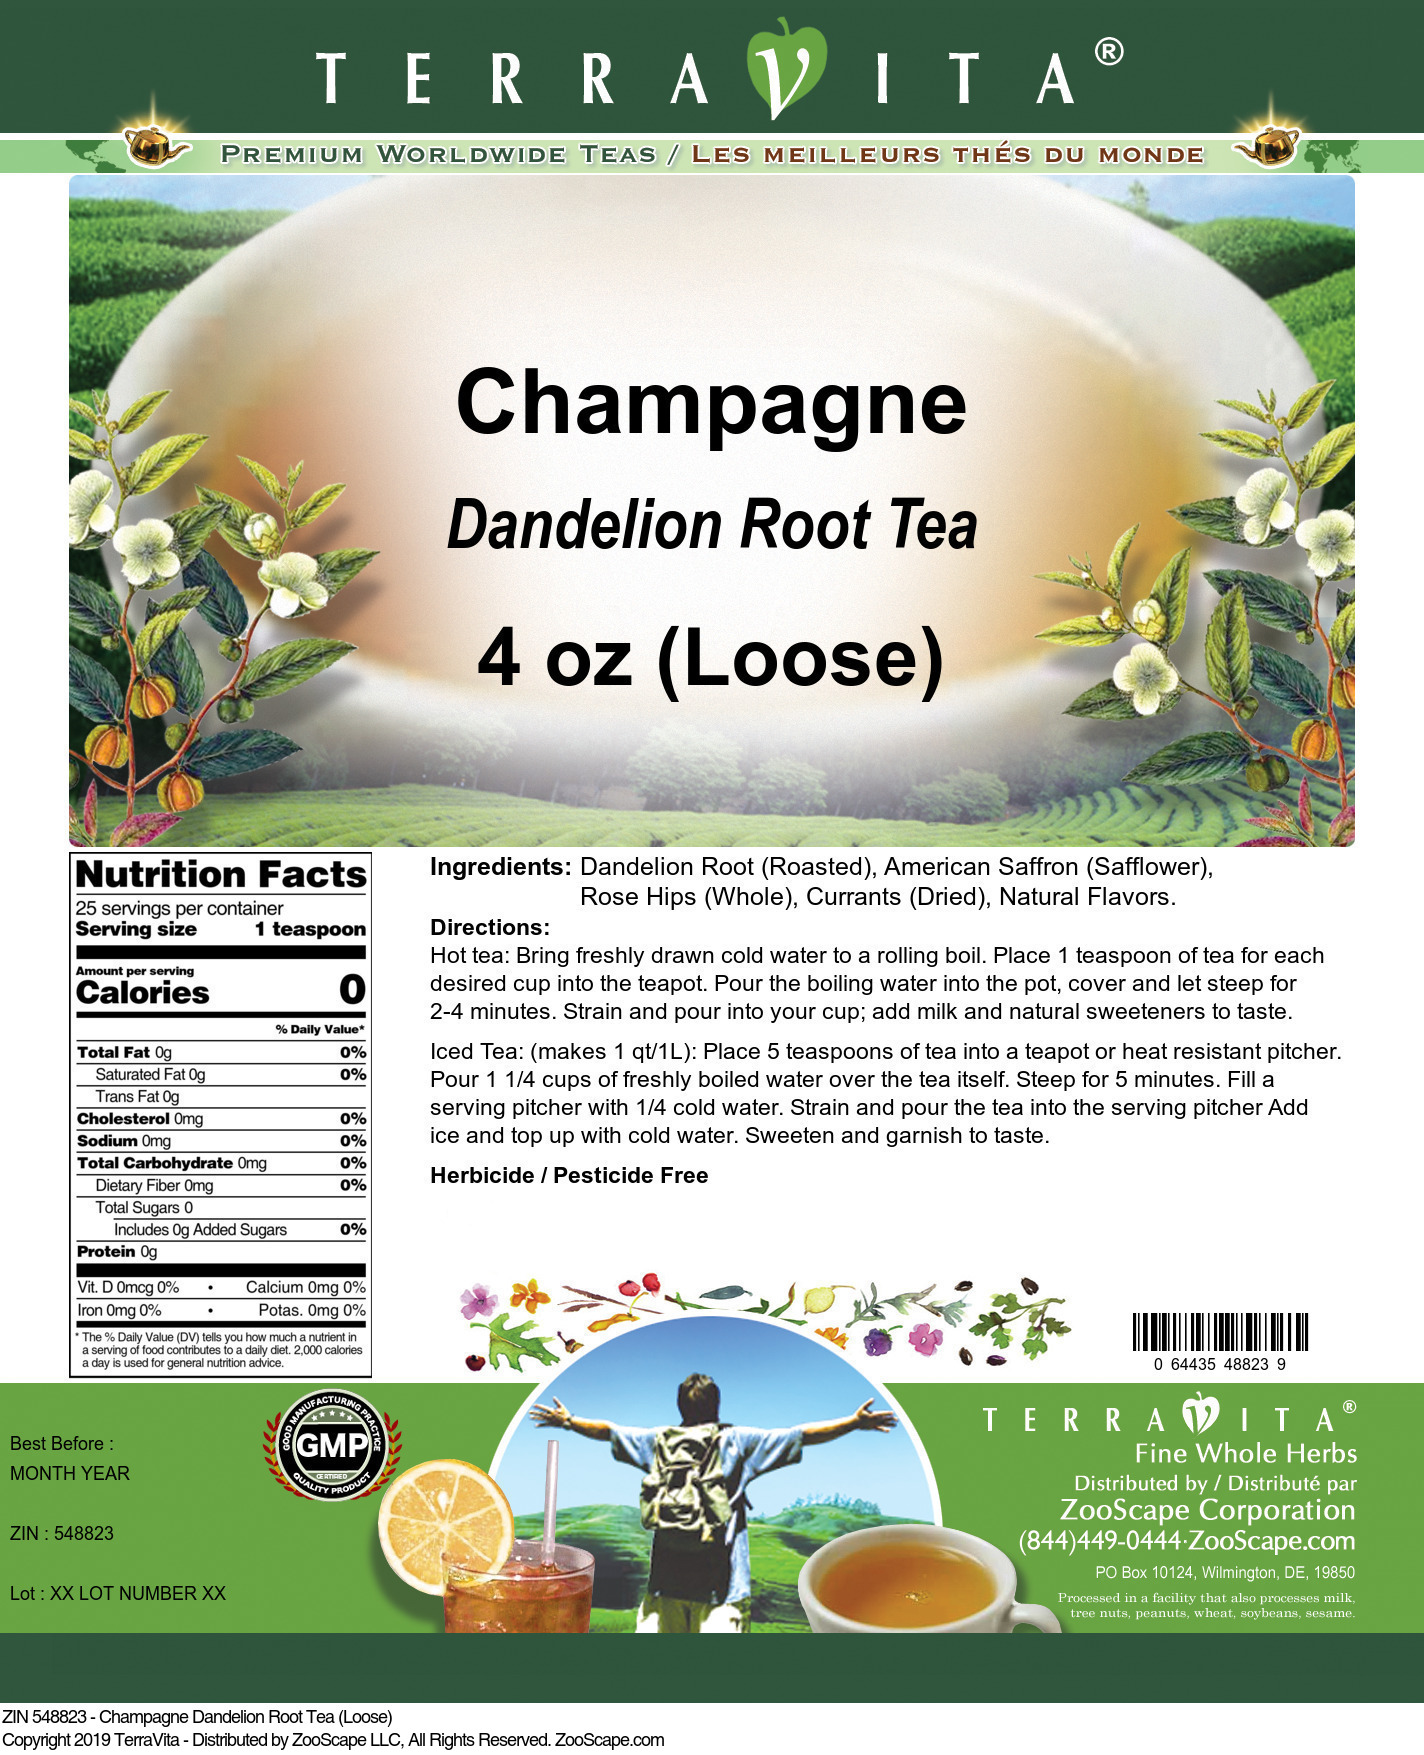 Champagne Dandelion Root